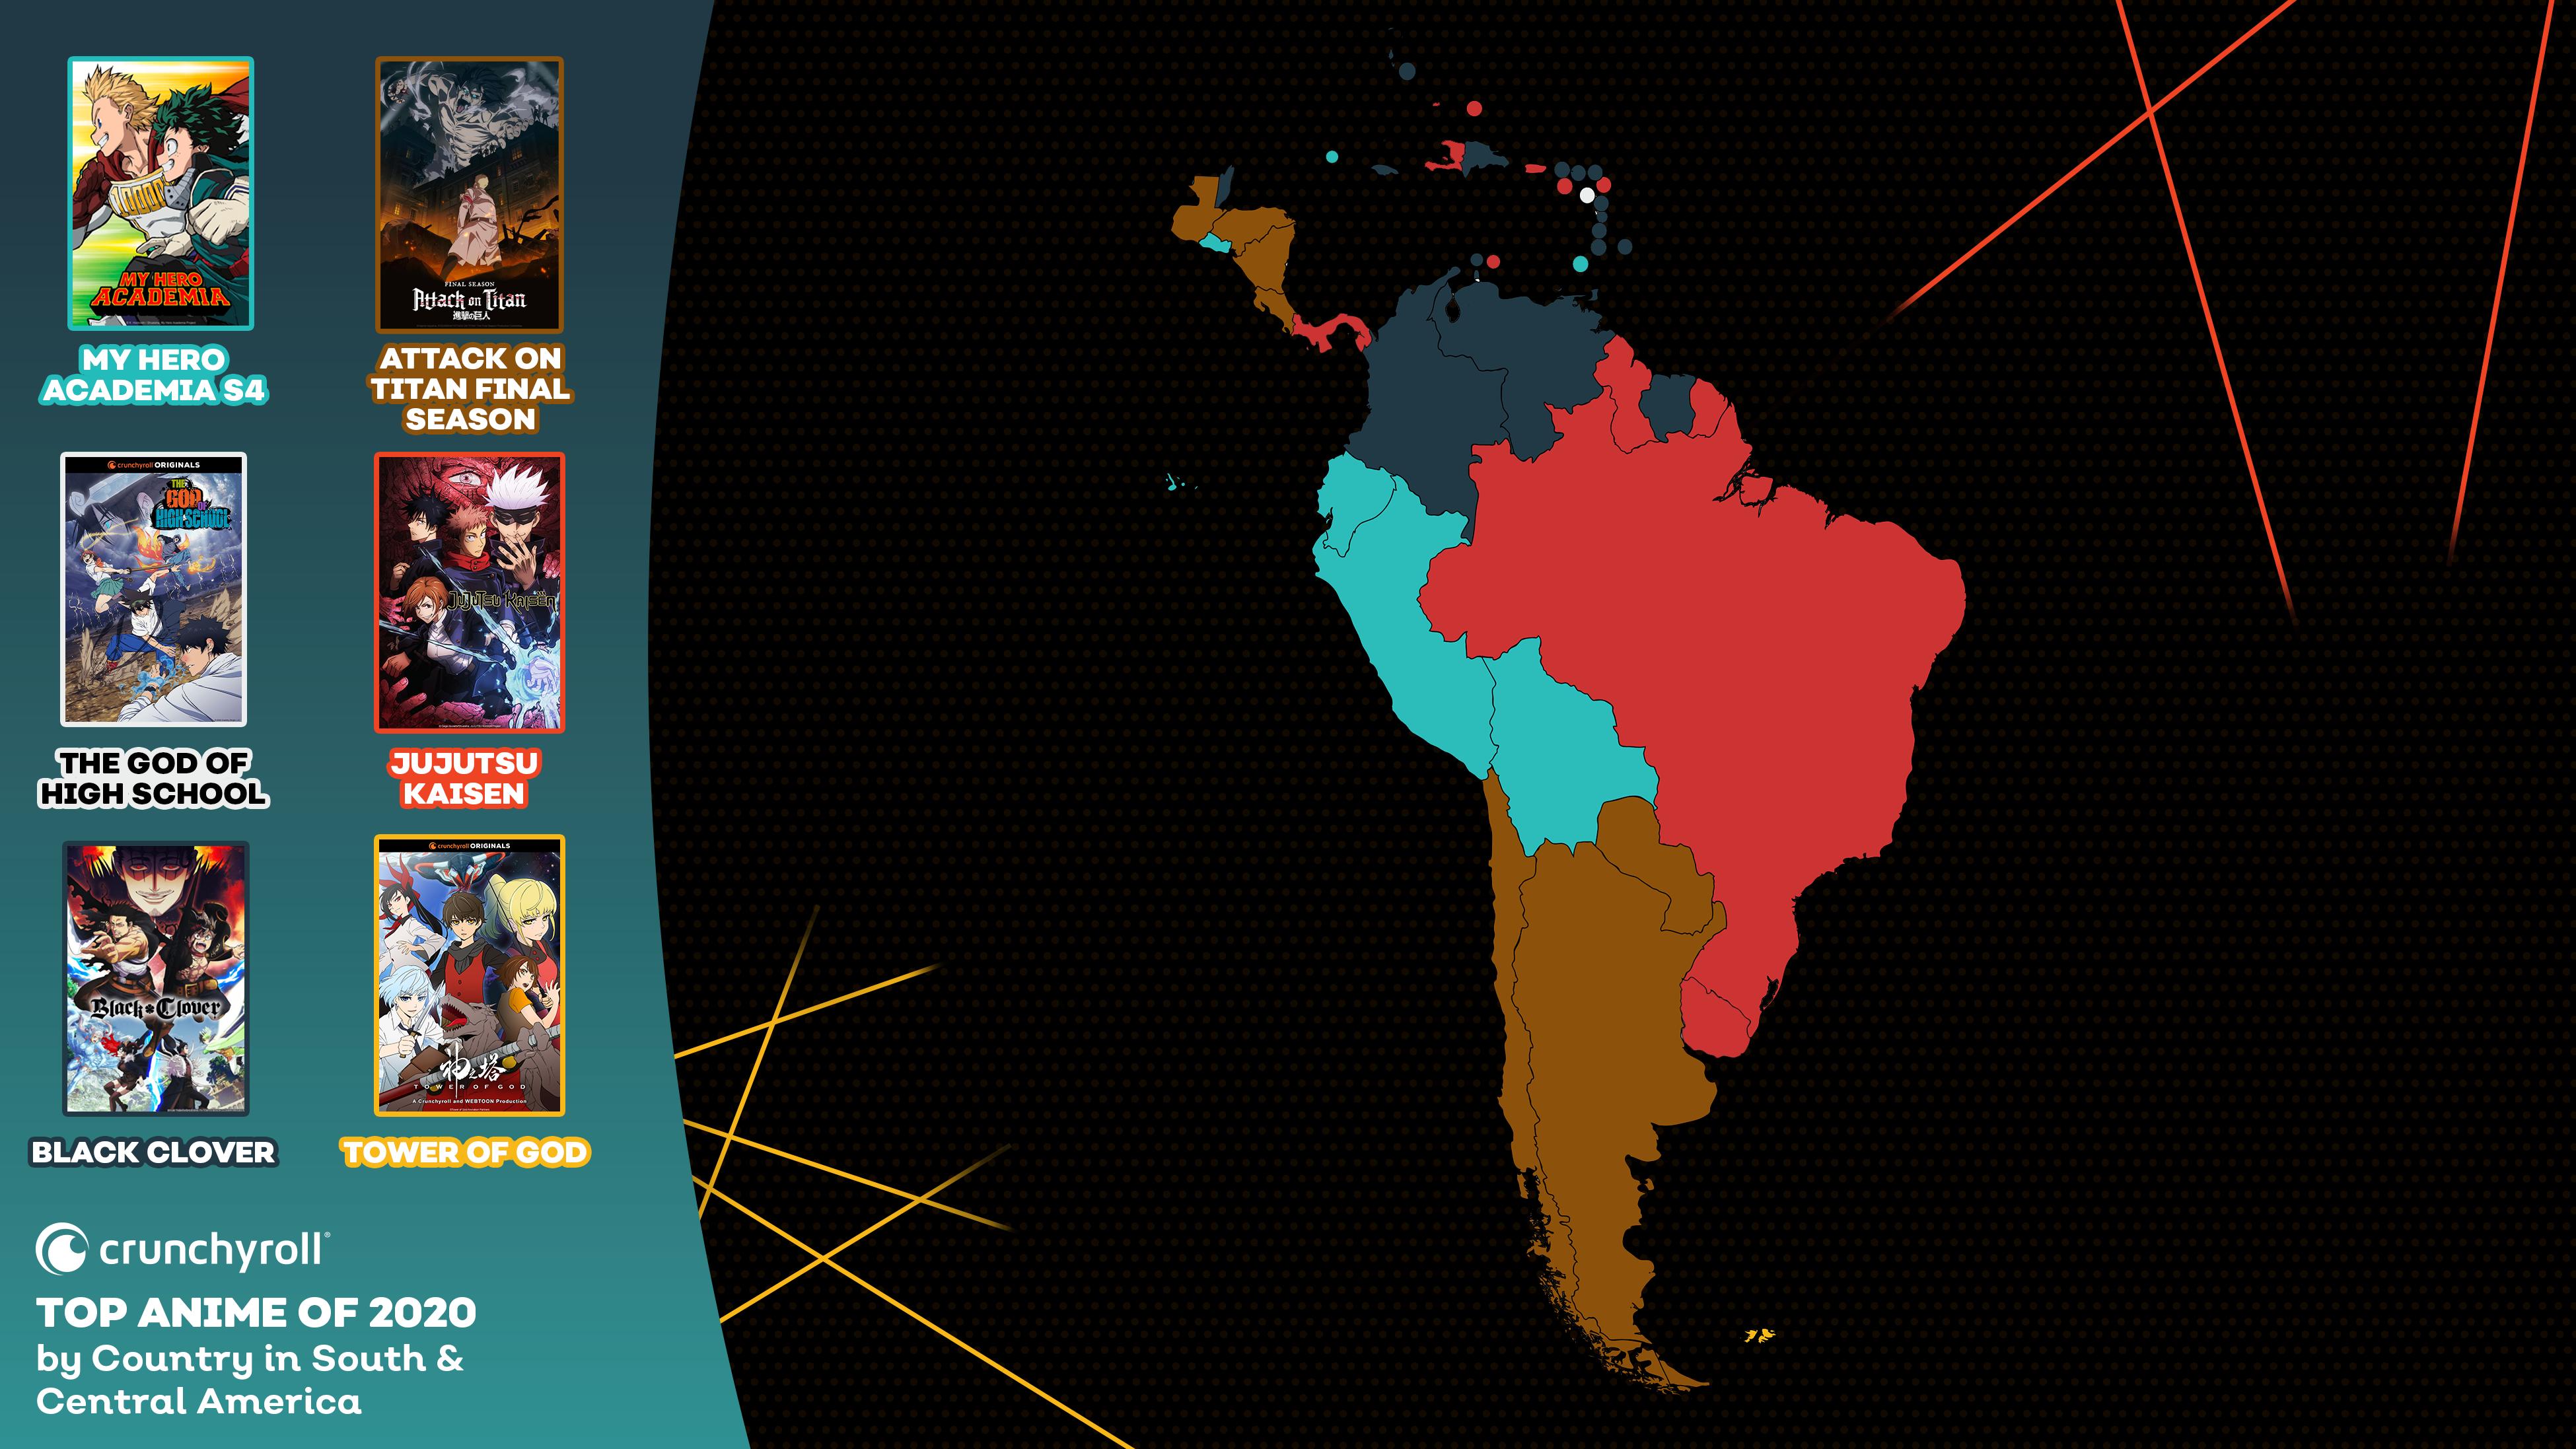 Mejor anime de 2020 por país: América del Sur